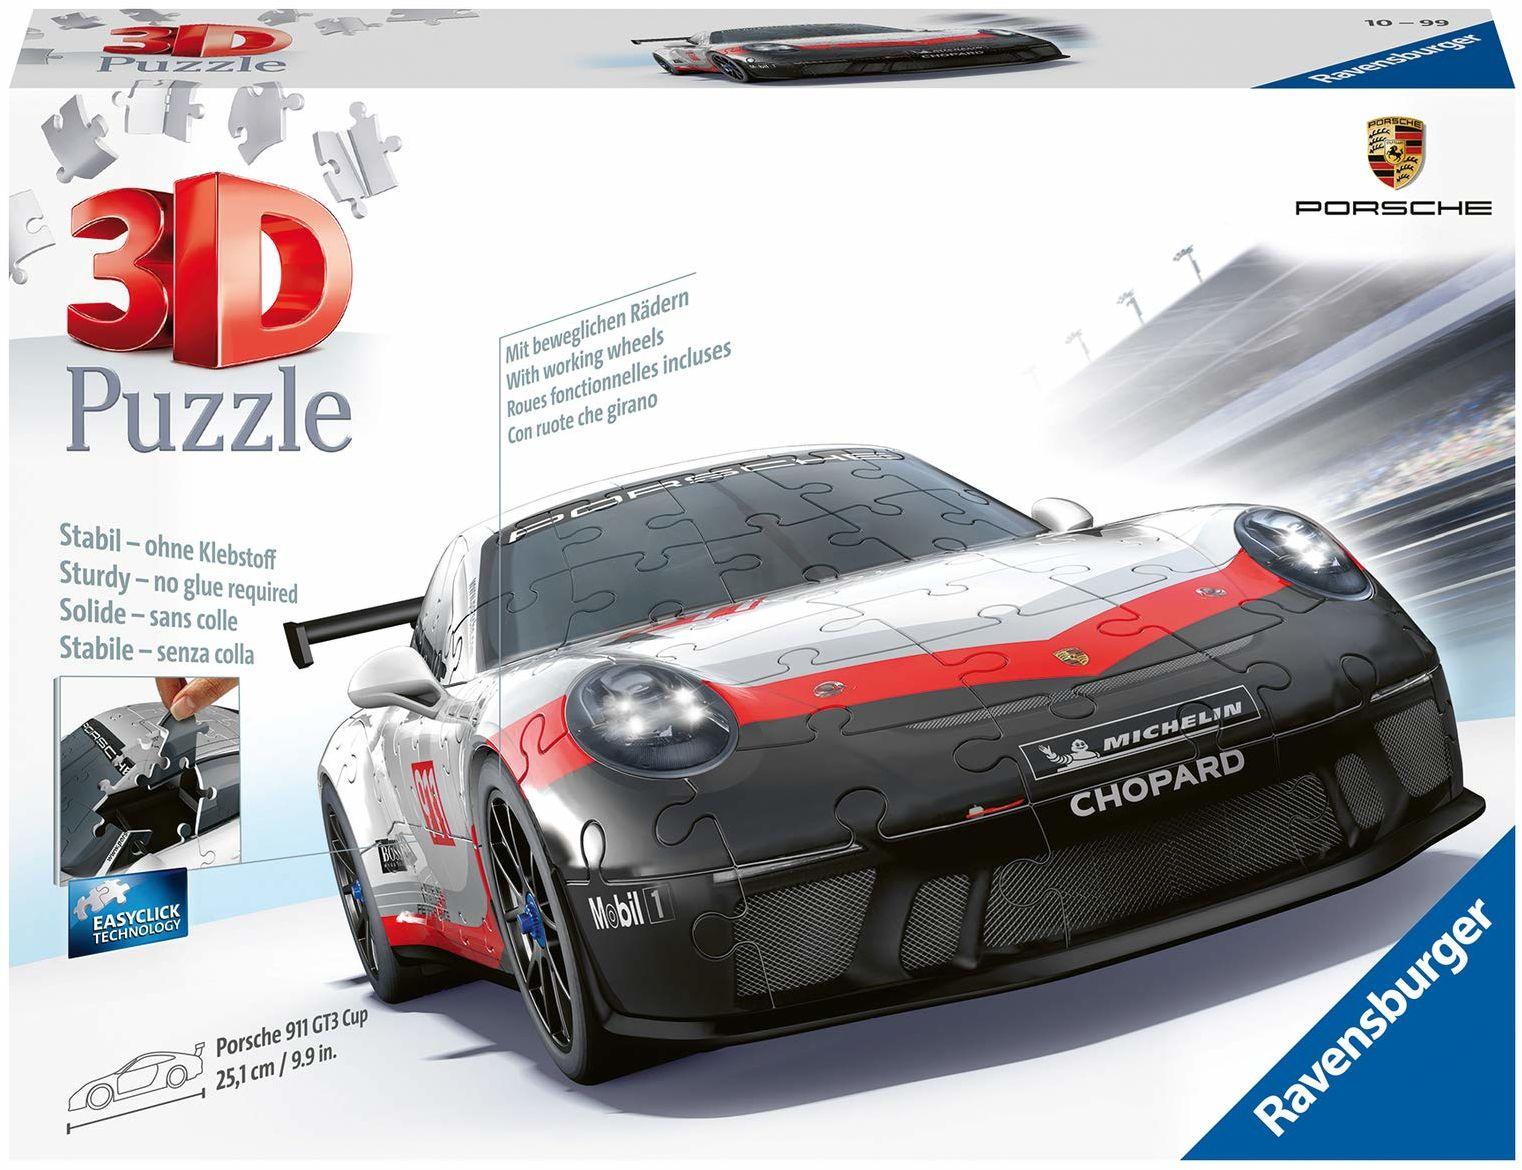 Ravensburger Puzzle 3D 11147 Ravensburger Porsche Gt3 Cup 108 Elementów Puzzle 3D Pojazdy (11147) Dla Dzieci I Dorosłych. Technologia Easy Click - Każdy Element Pasuje Idealnie